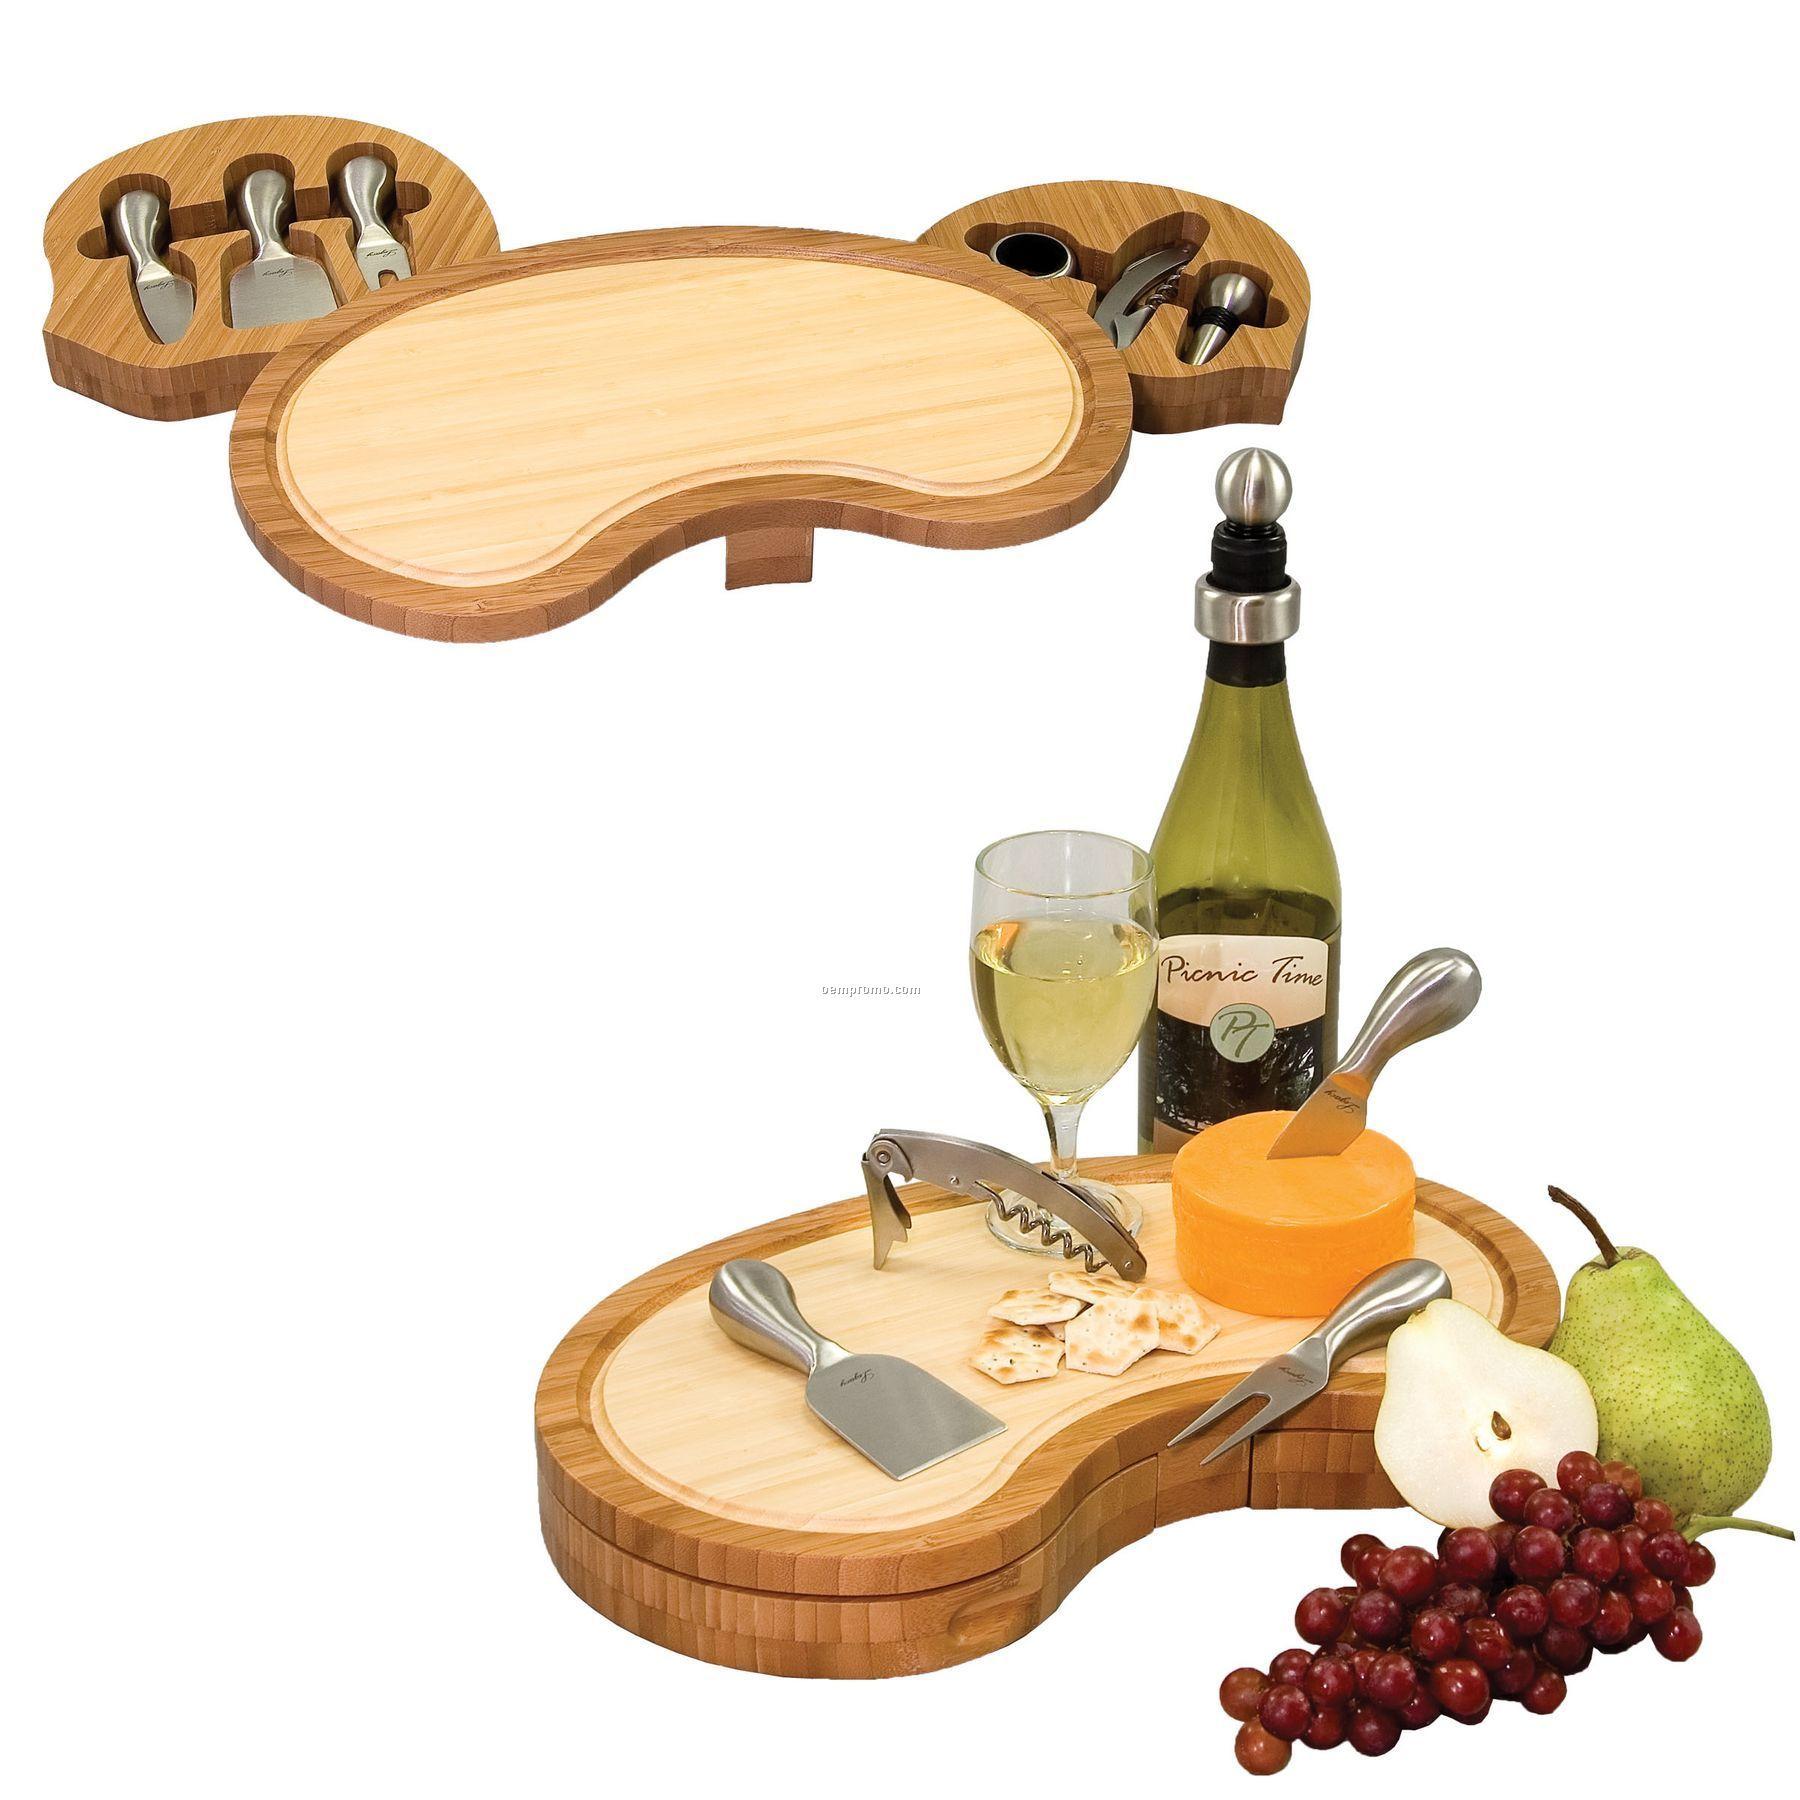 Mariposa Gourmet 2 Tone Cutting Board W/ 6 Wine & Cheese Tools In 2 Drawers